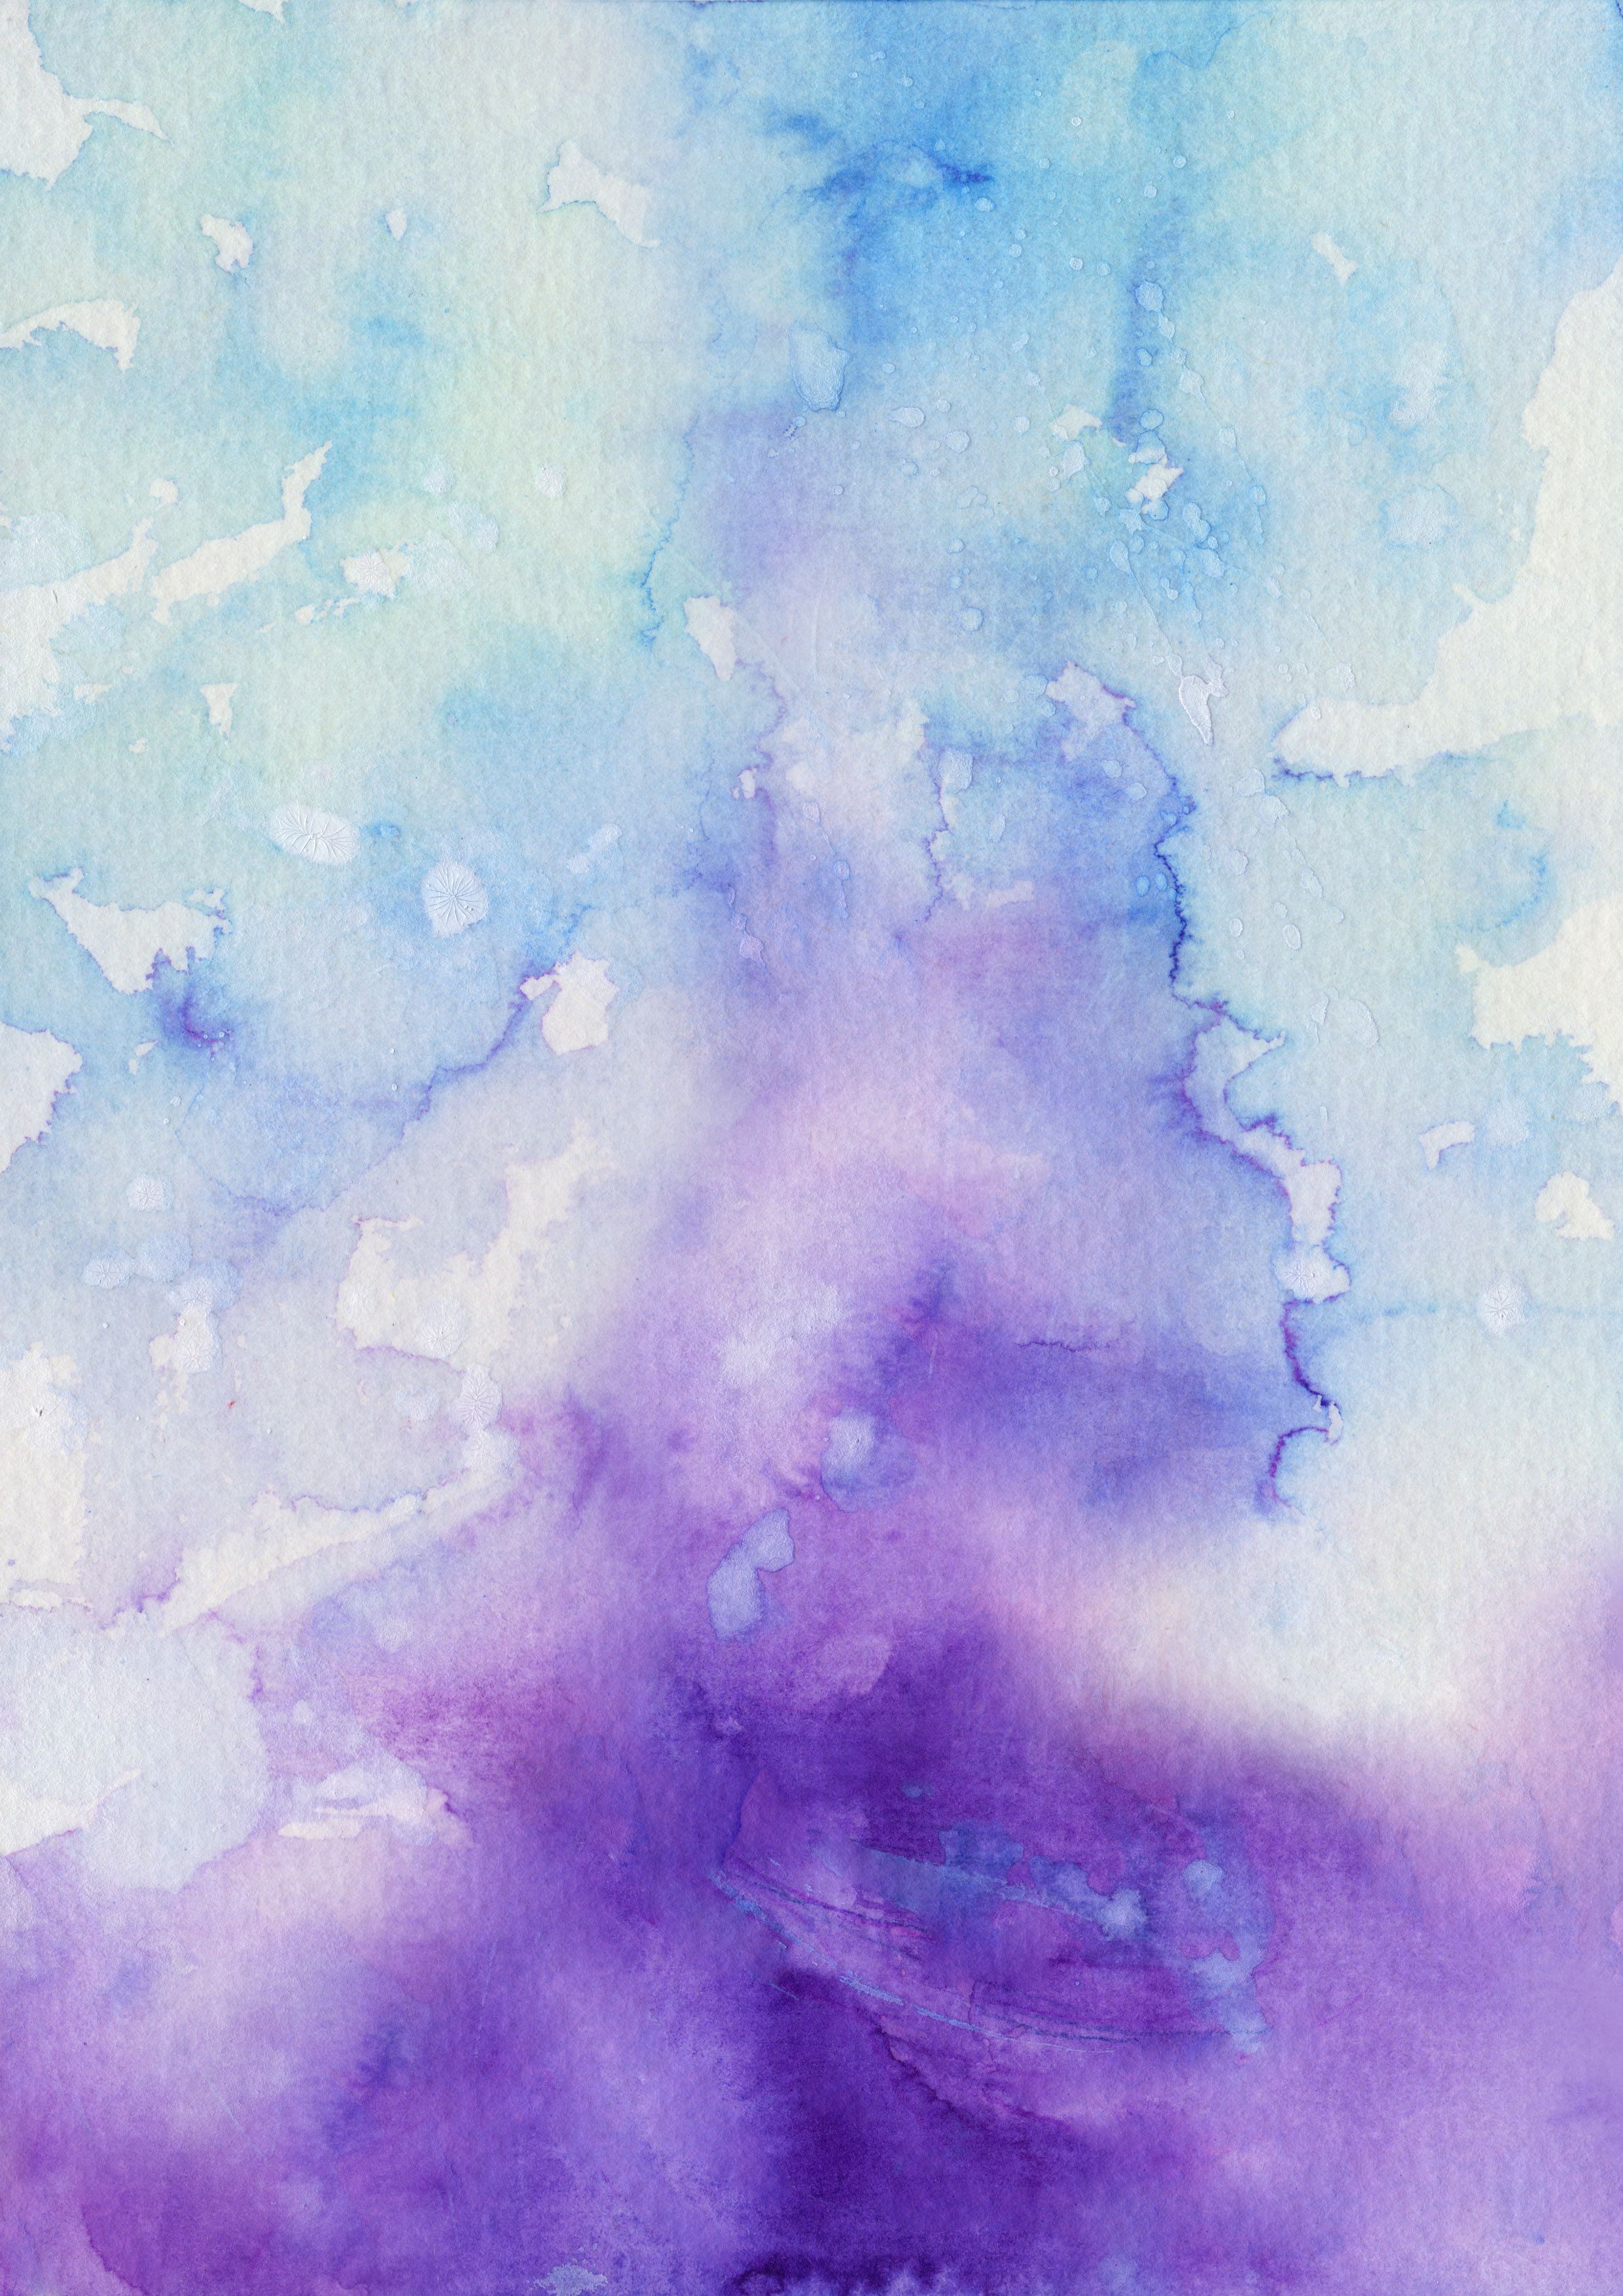 Stock Watercolor Texture Frost By Aurorawienhold Deviantart Com Tecnicas De Aquarela Tecnicas De Pintura Em Aquarela Fundo De Aquarela